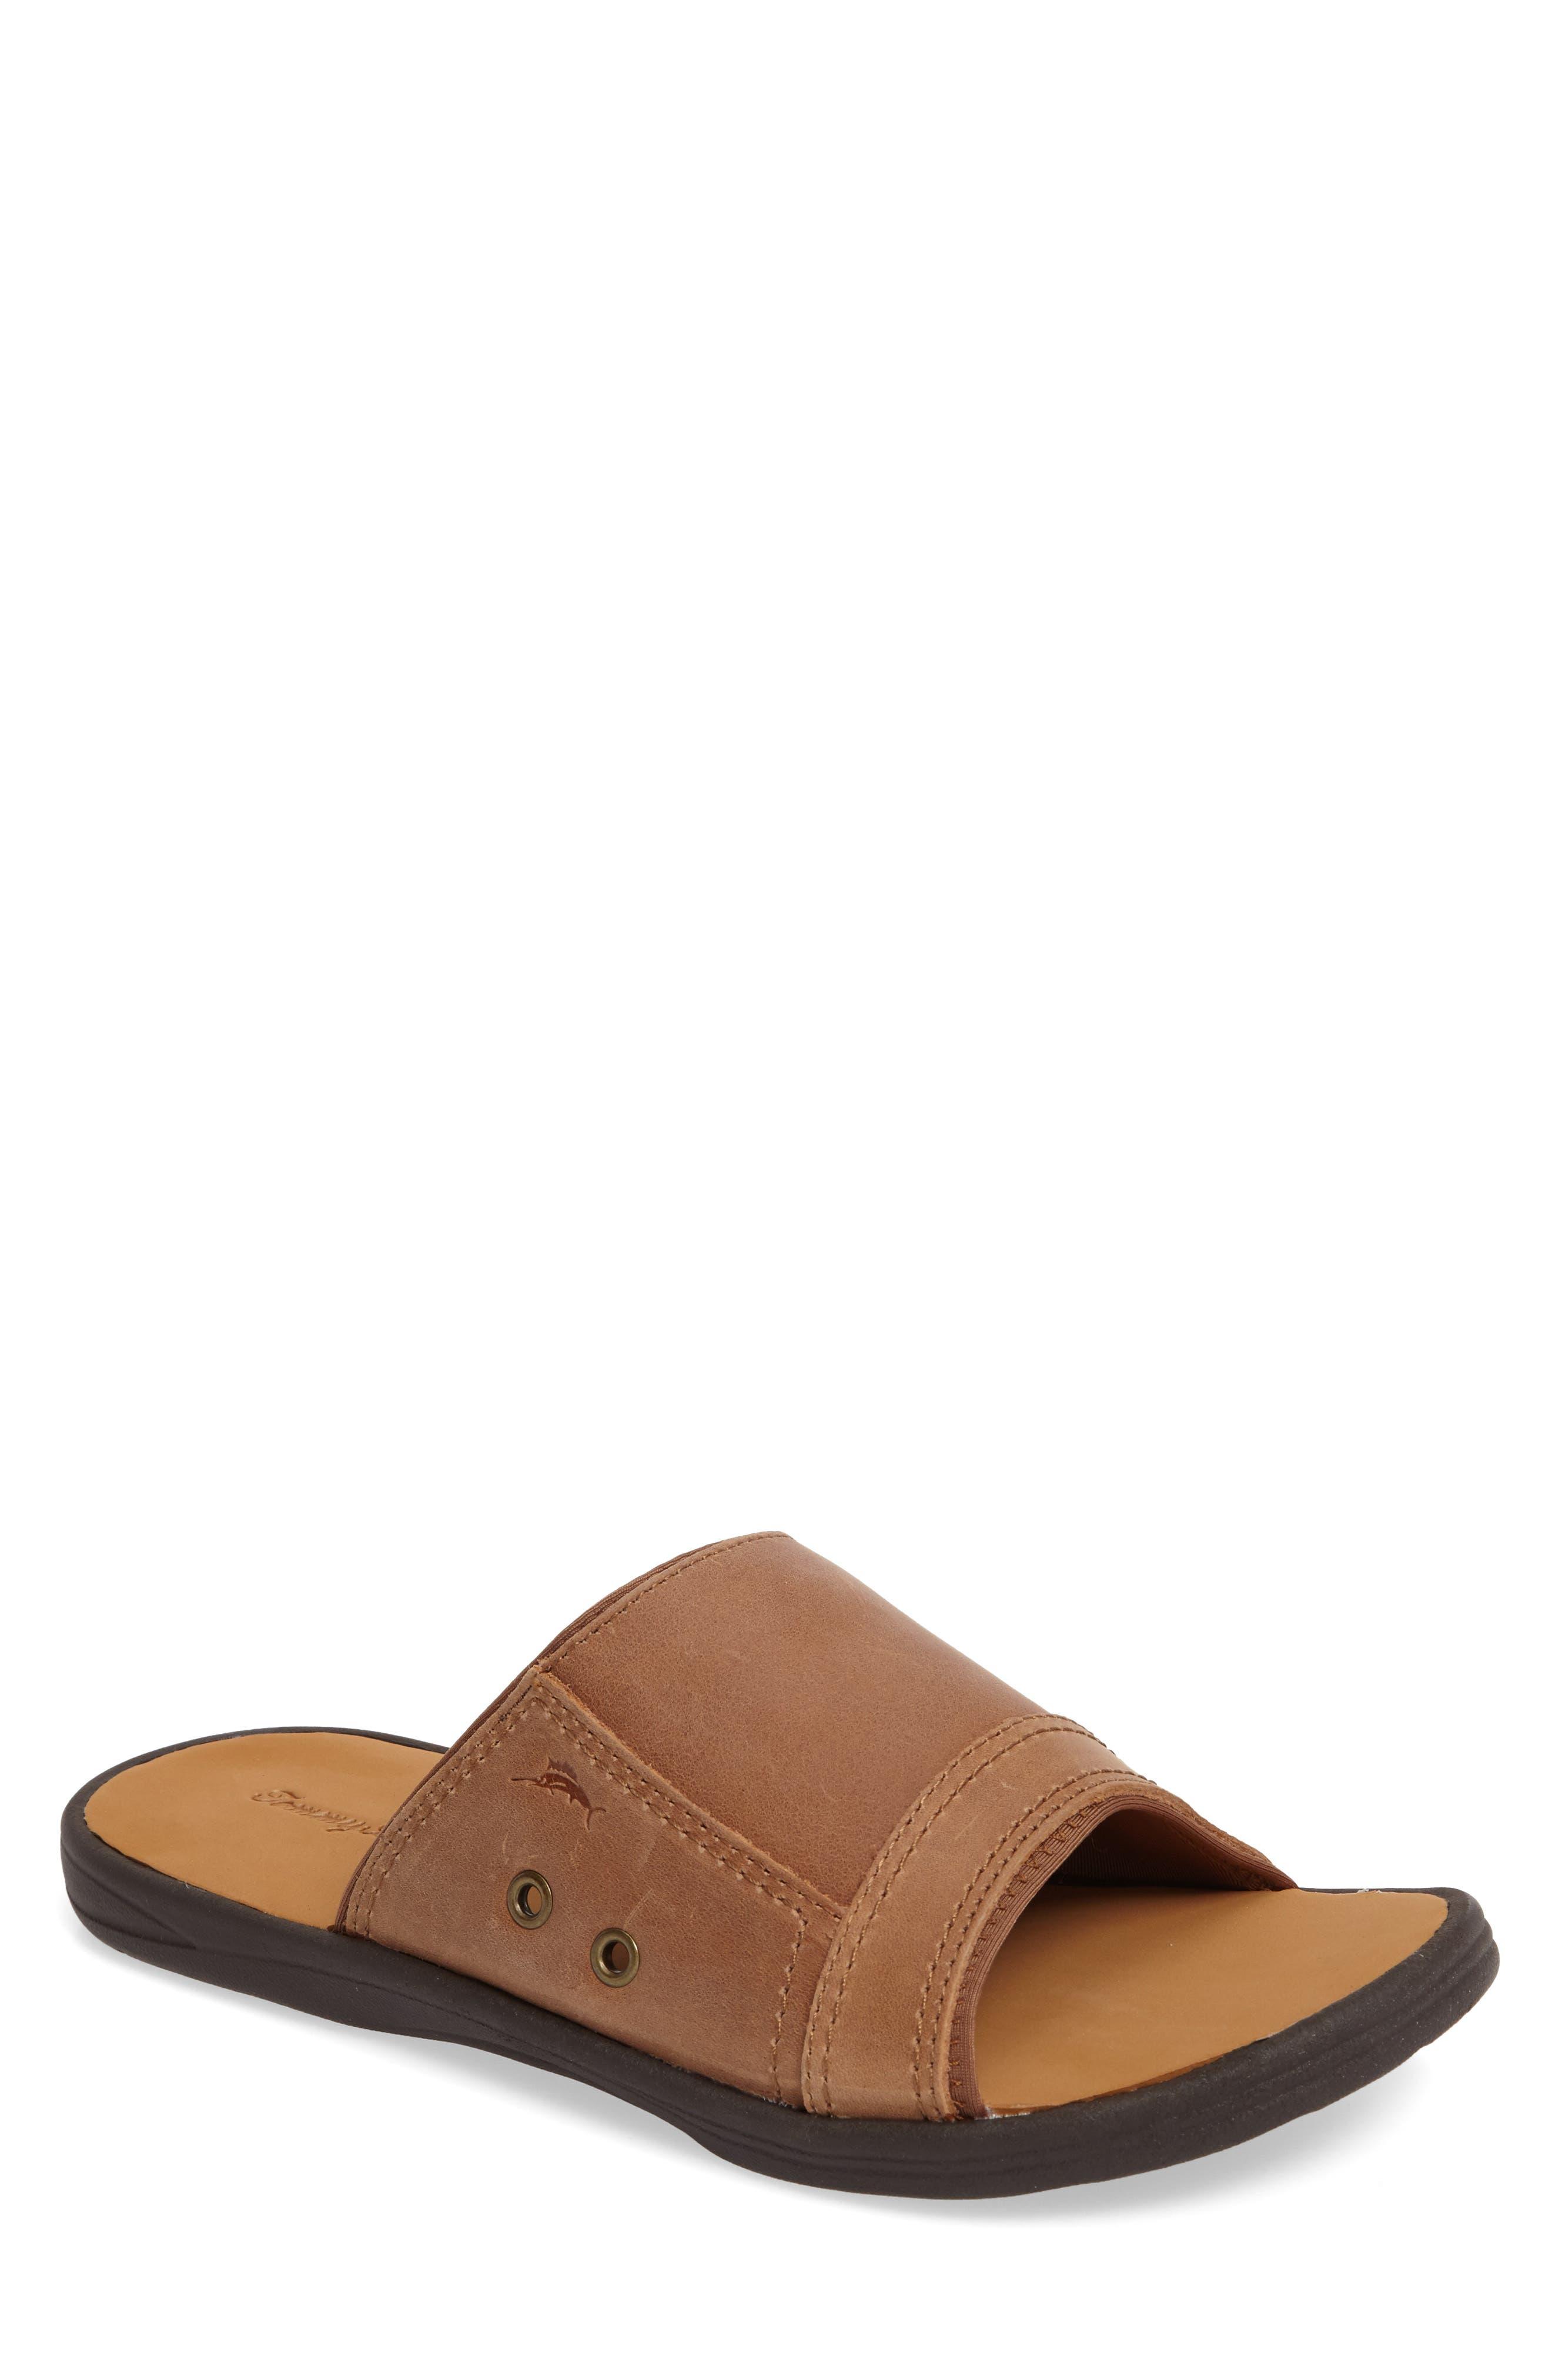 Tommy Bahama Seawell Slide Sandal (Men)